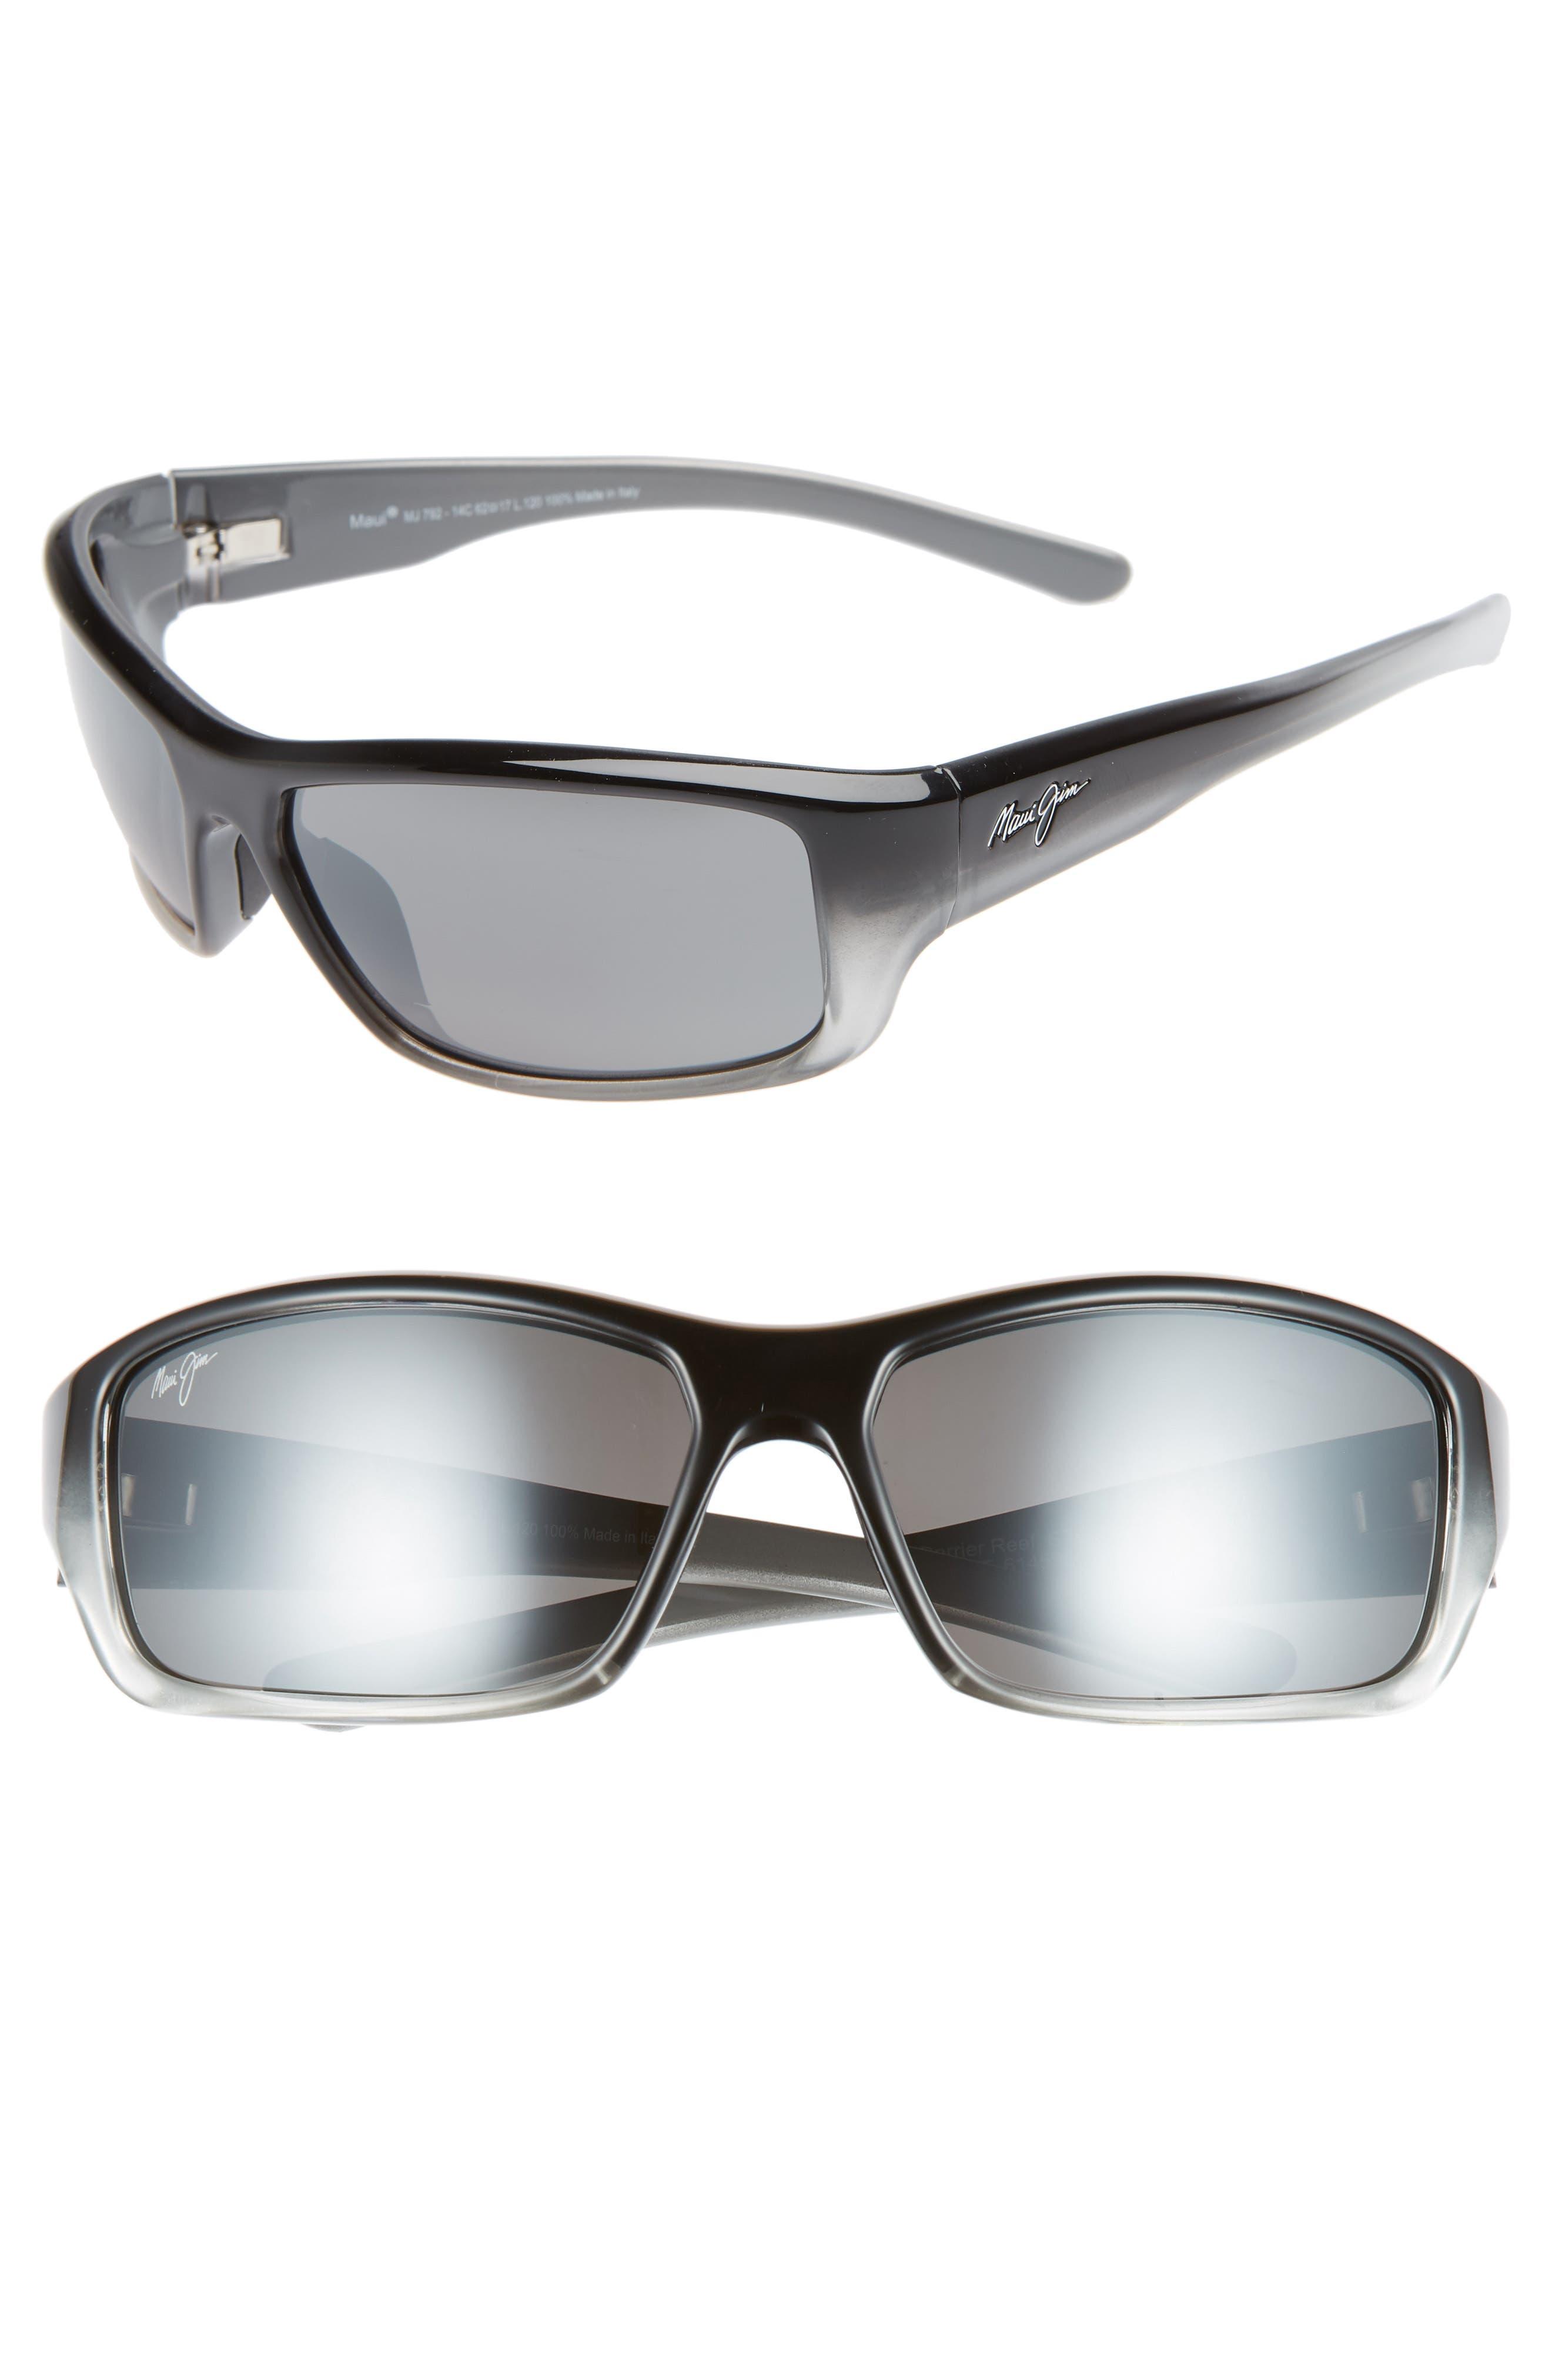 MAUI JIM Barrier Reef 62mm PolarizedPlus2<sup>®</sup> Sunglasses, Main, color, BLACK/ GREY